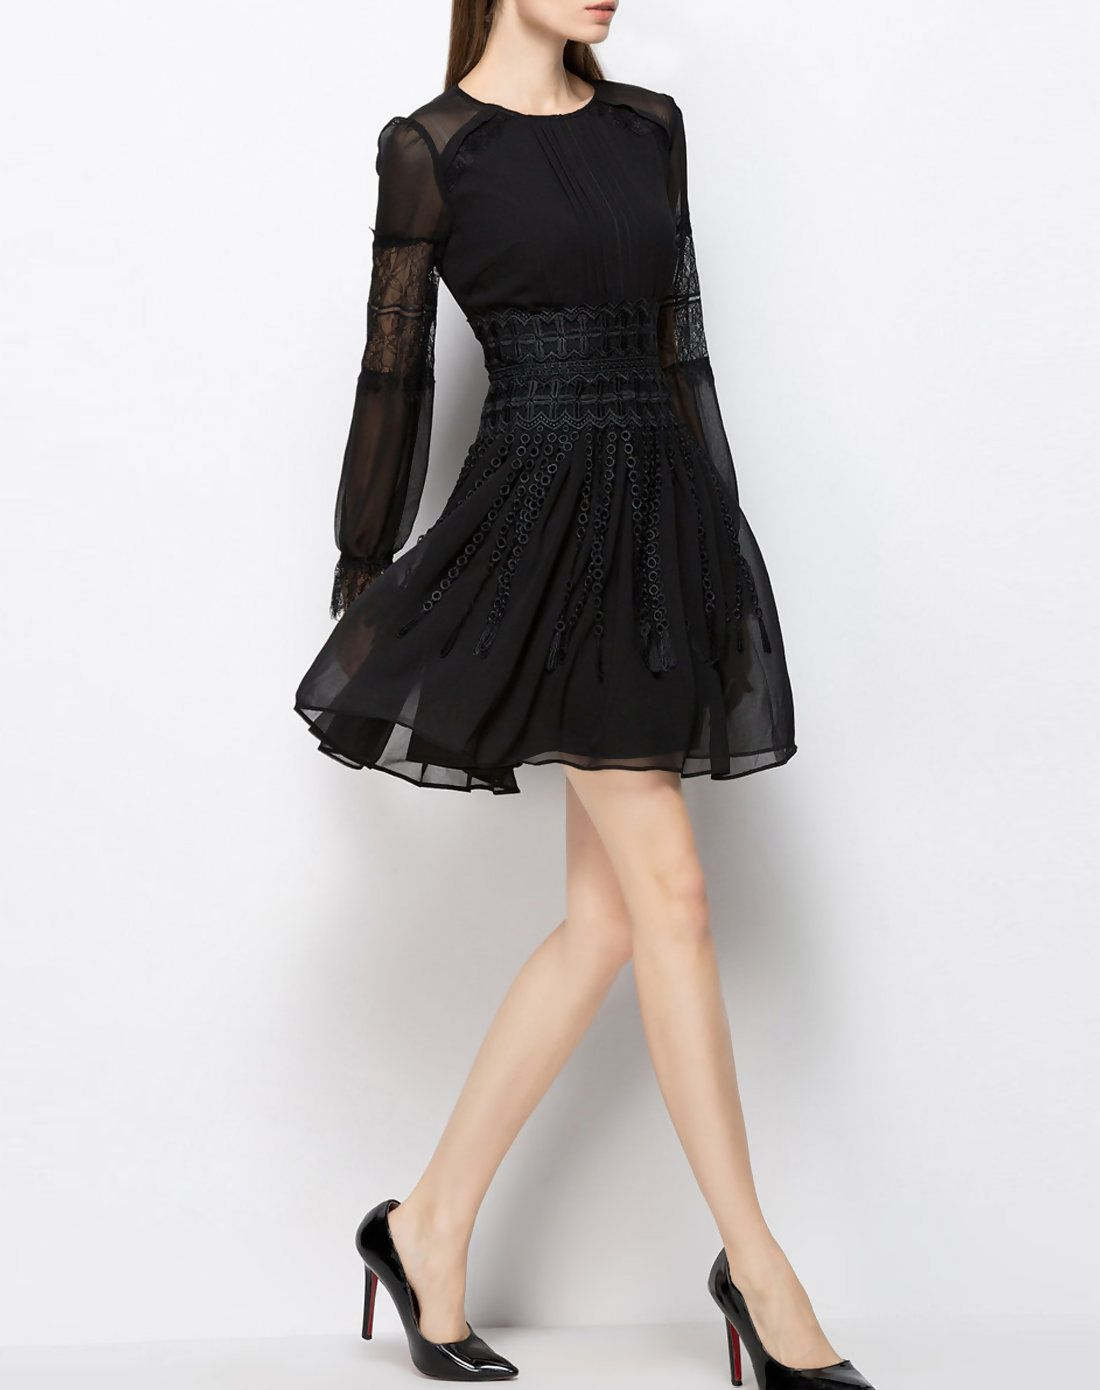 Appealing long sleeve simple chiffon mini dress black yi pin wan